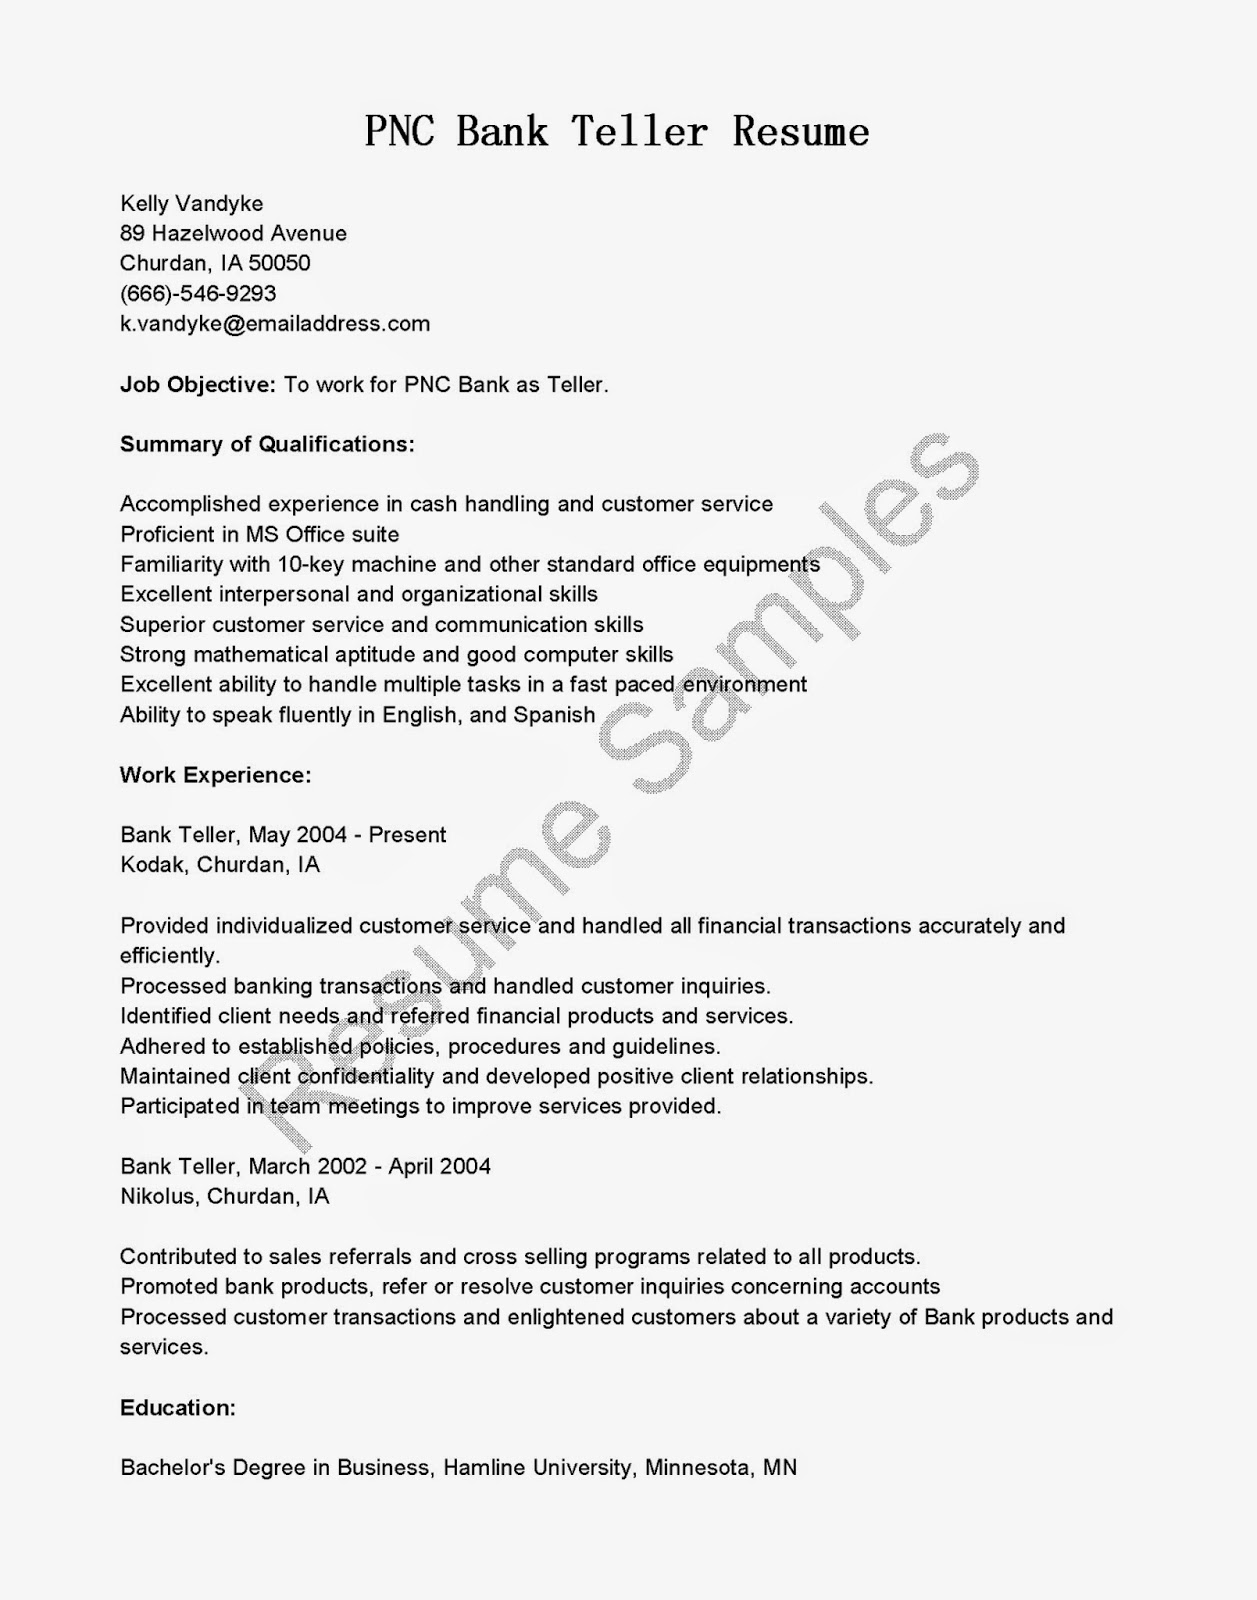 teller bank resume bank teller experience resume - How To Write A Resume For A Bank Teller Position